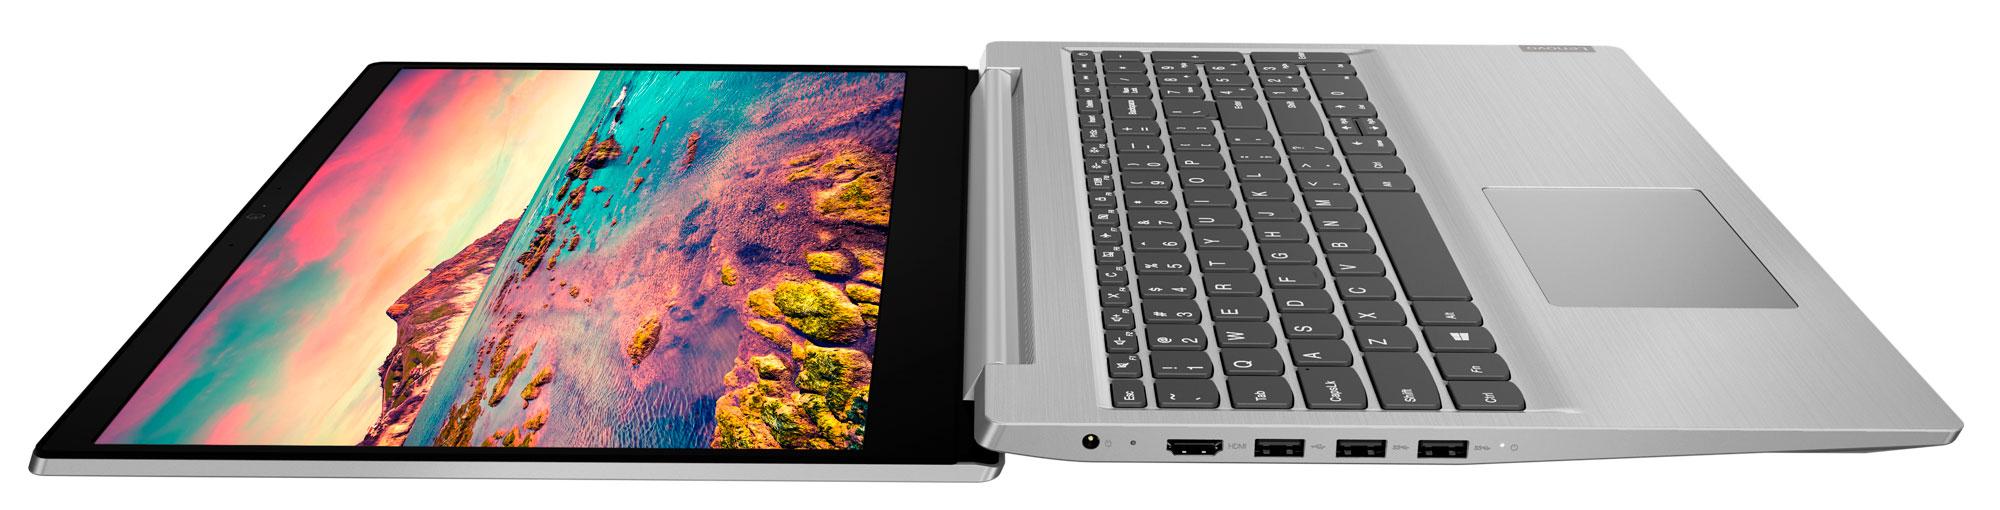 Фото  Ноутбук Lenovo ideapad S145-15API Platinum Grey (81UT00MLRE)